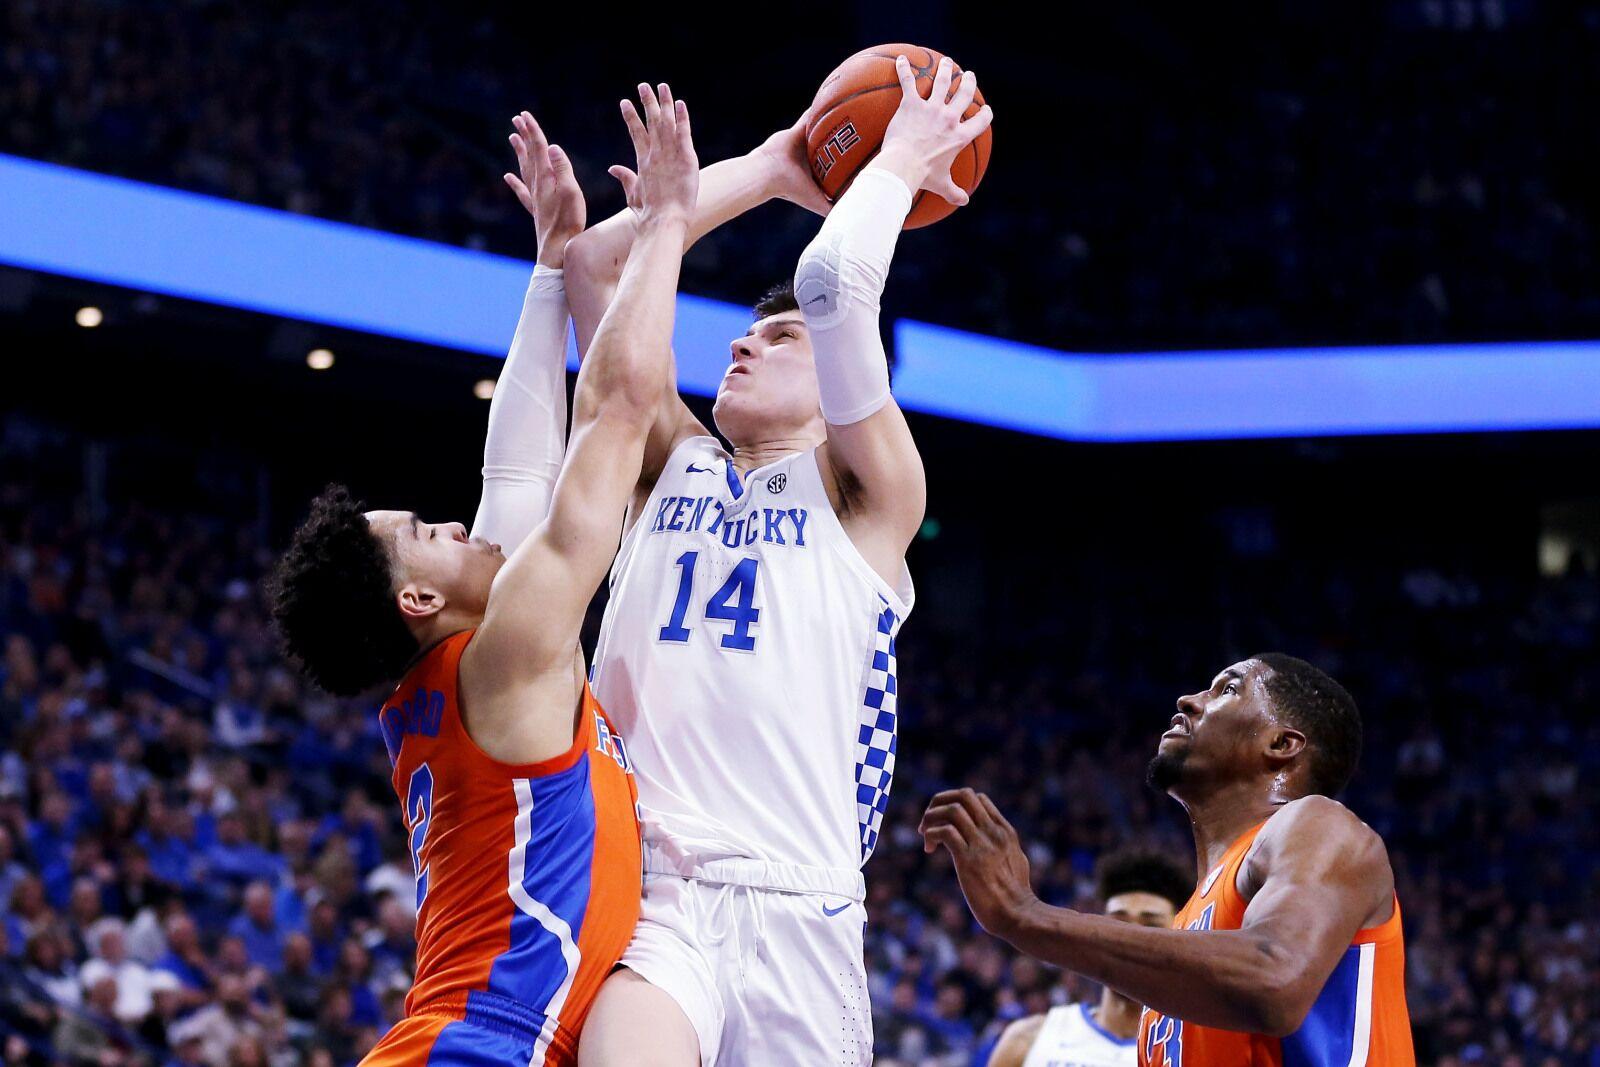 Kentucky Basketball Fox Named Sec Freshman Of The Week: Flipboard: Kentucky Basketball: Tyler Herro Rings In